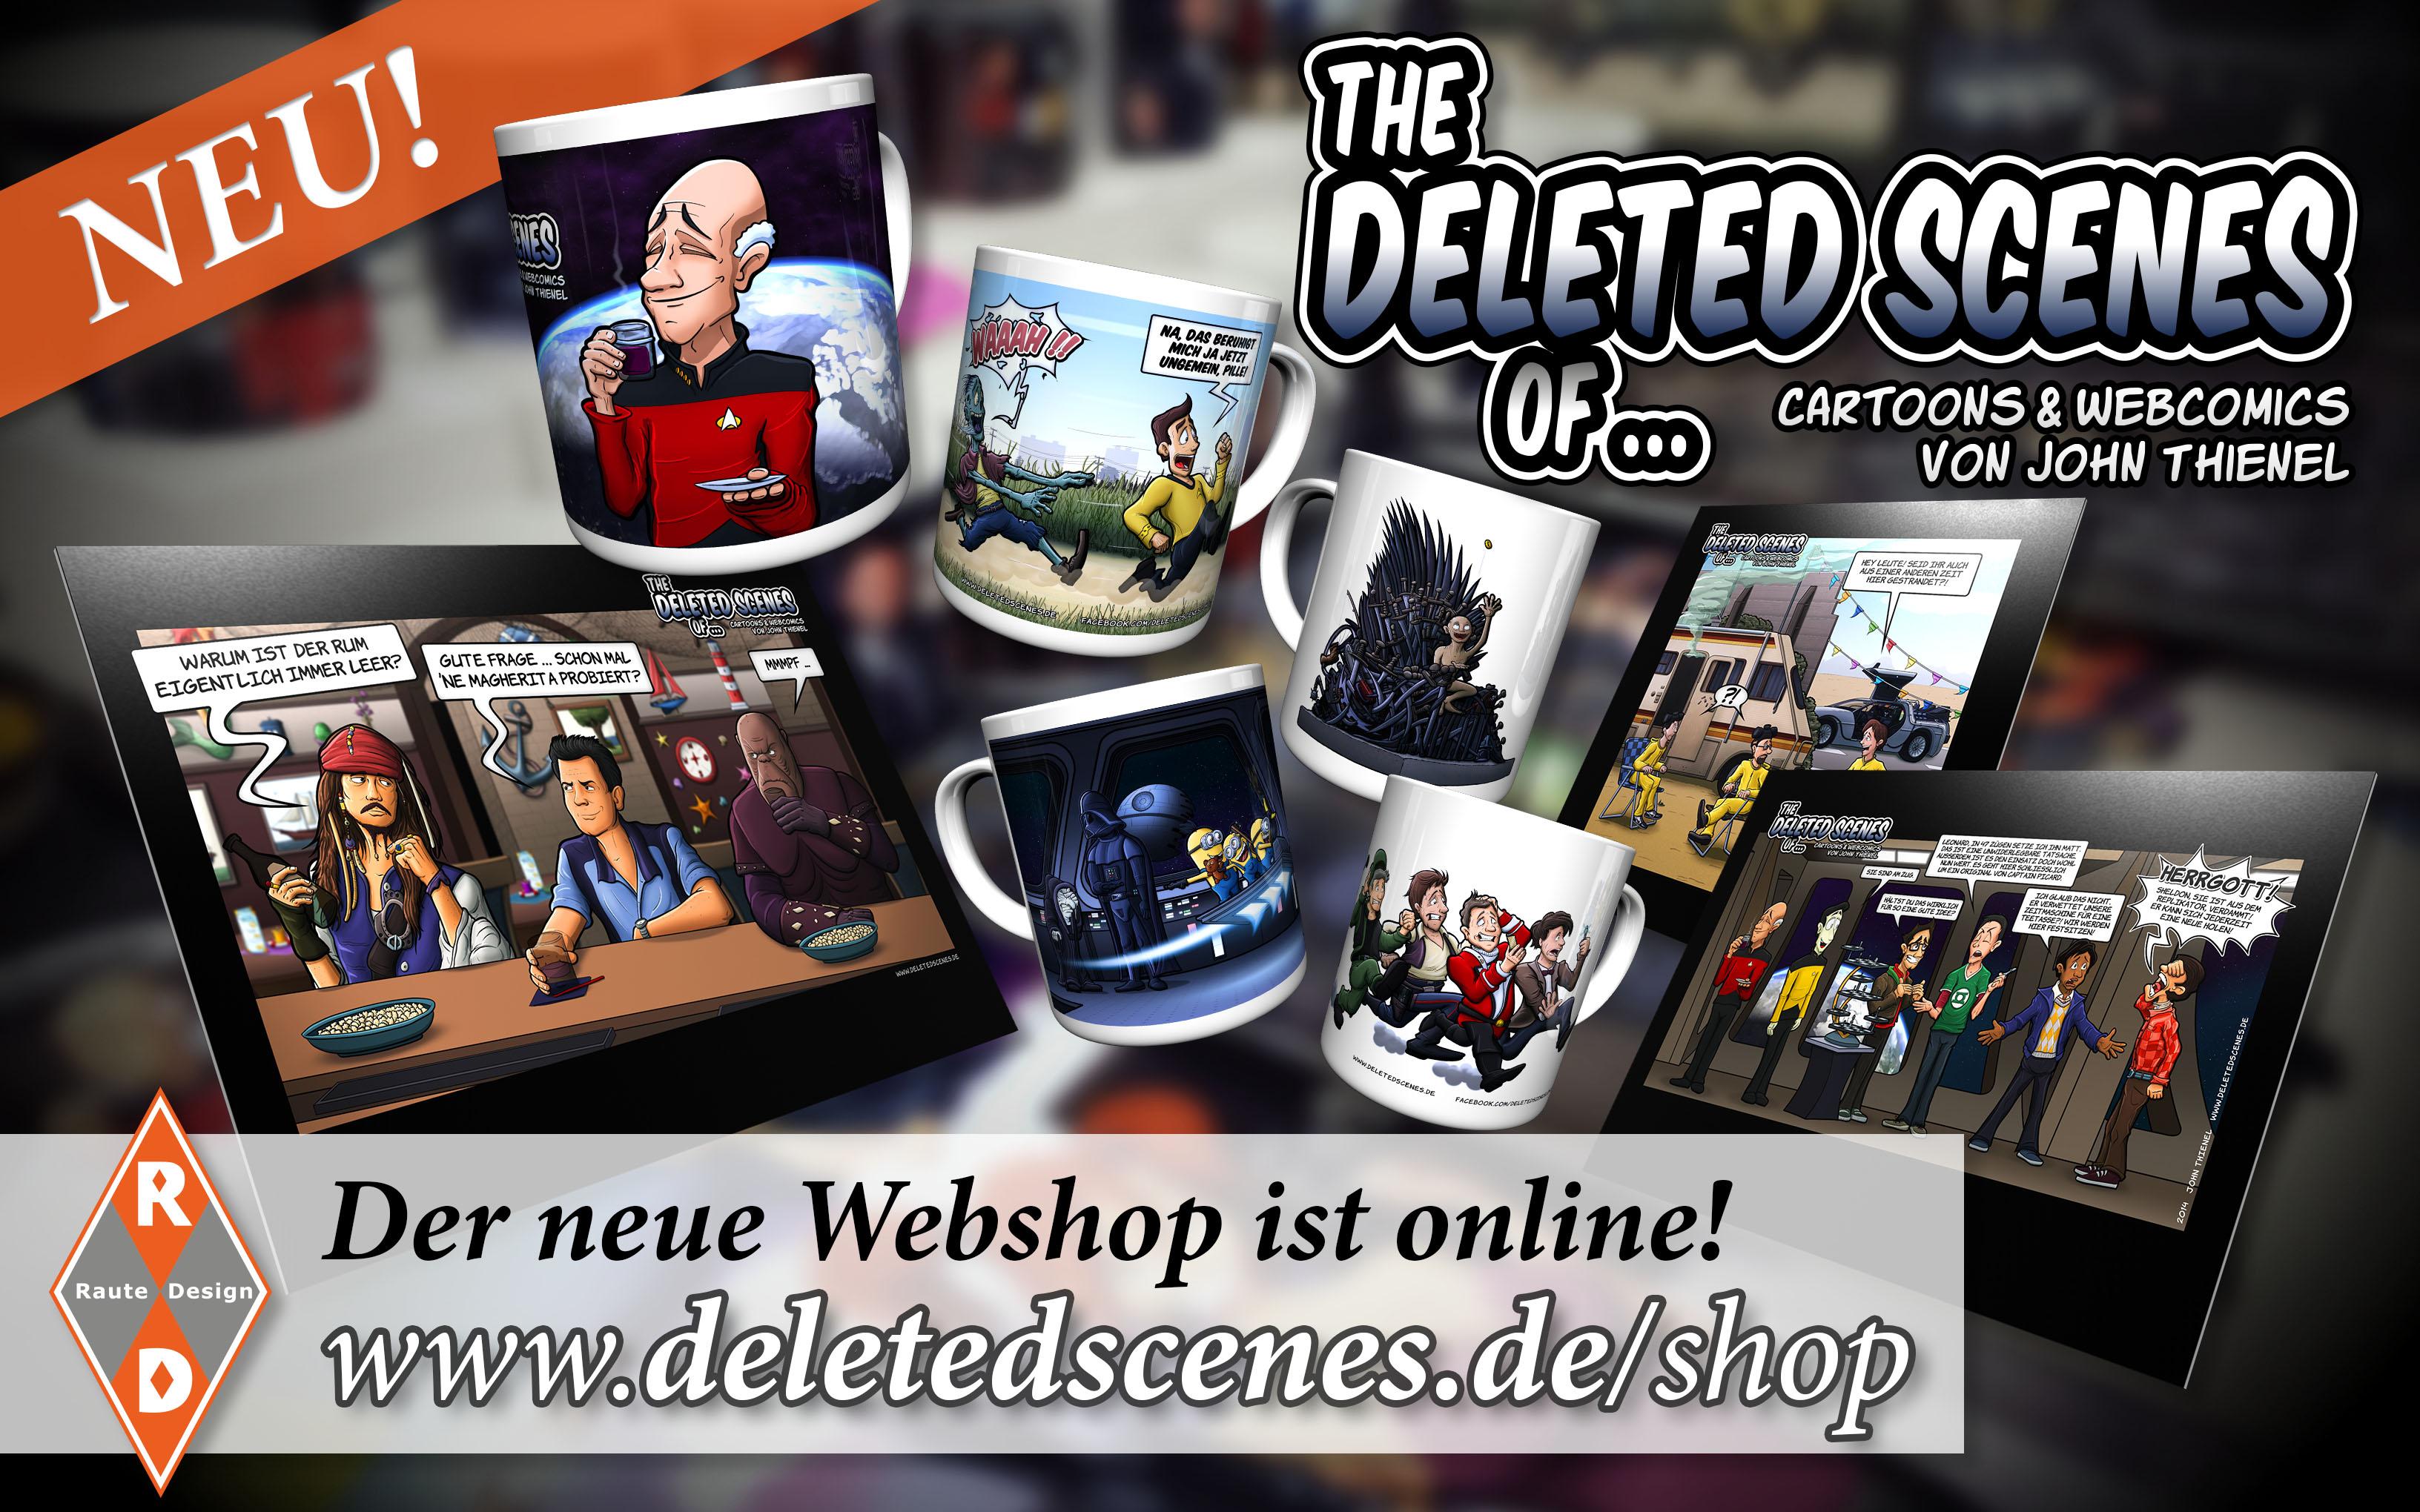 Deleted Scenes - Webshop